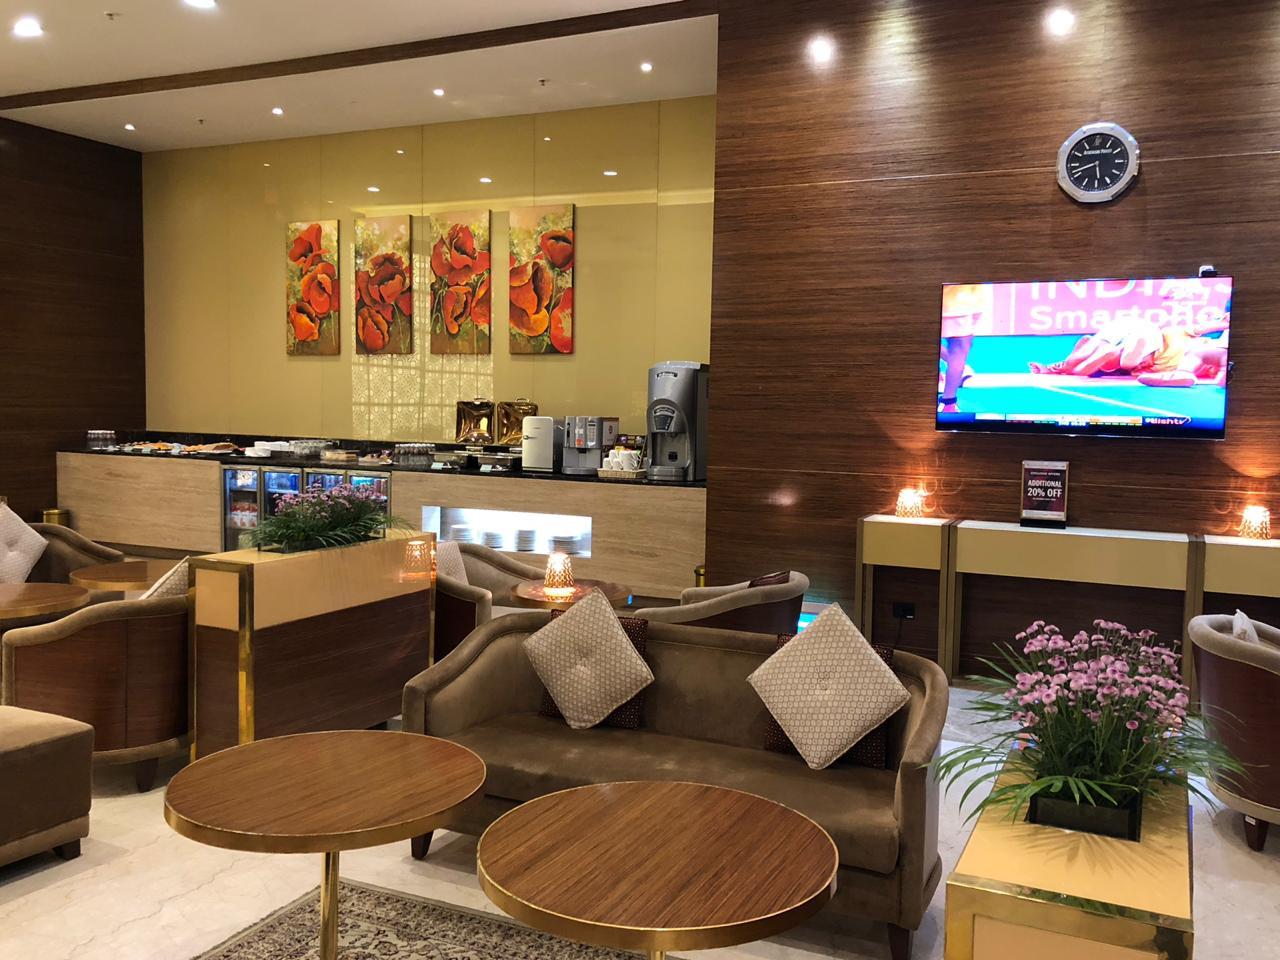 Chhatrapati Shivaji Maharaj International Airport, Jaya He GVK Museum, mumbai airport, Pranaam GVK Guest Services, Premium Elite Service